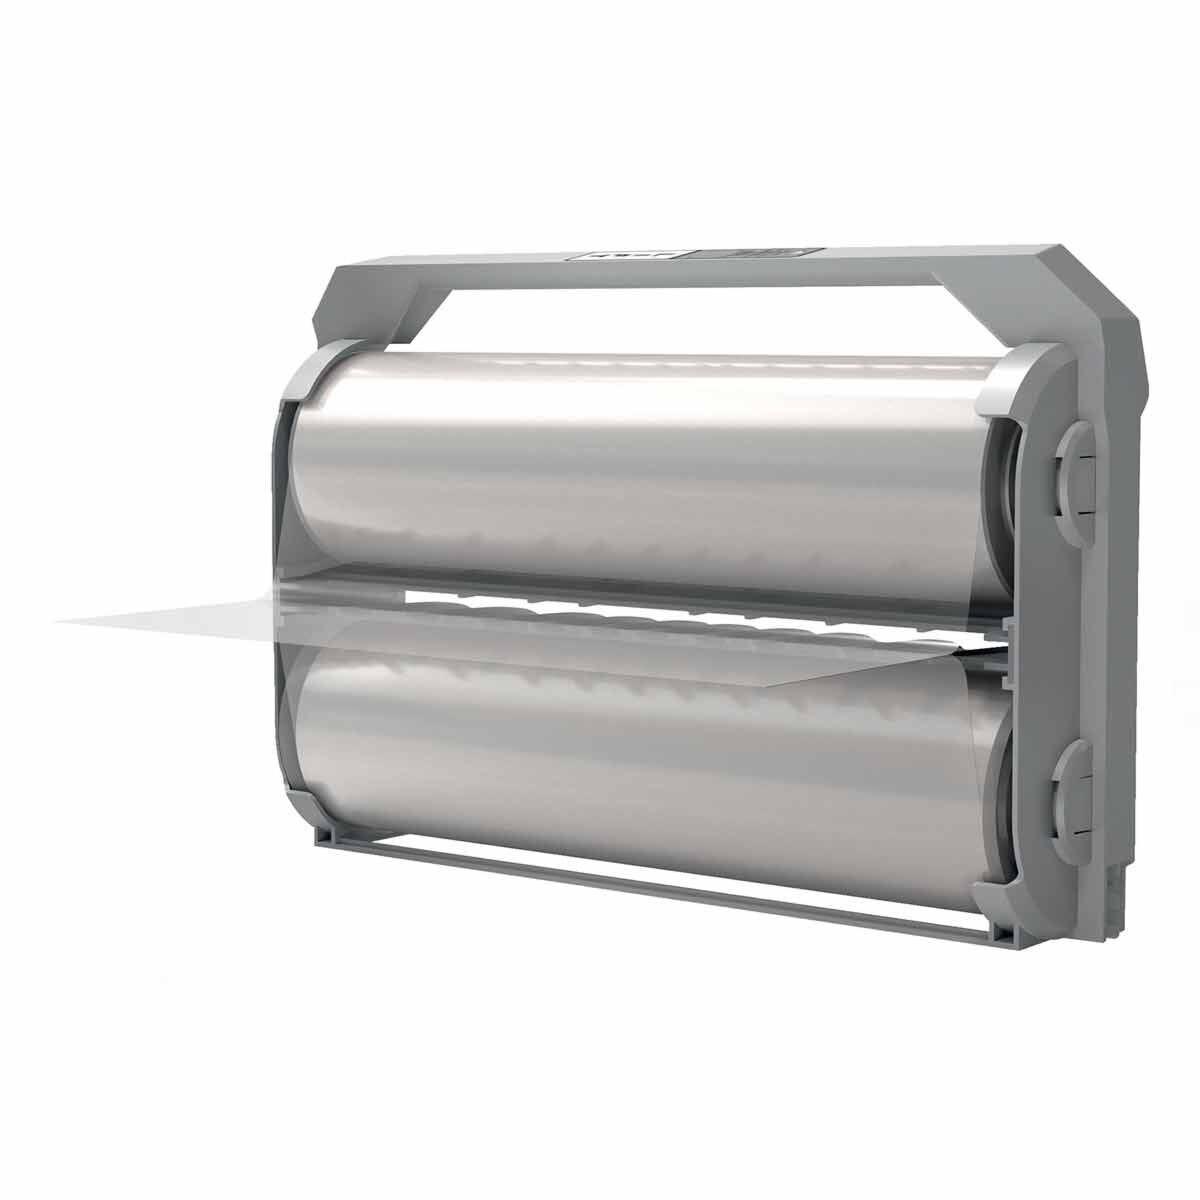 GBC Foton 30 Laminator Film Cartridge 75 Micron